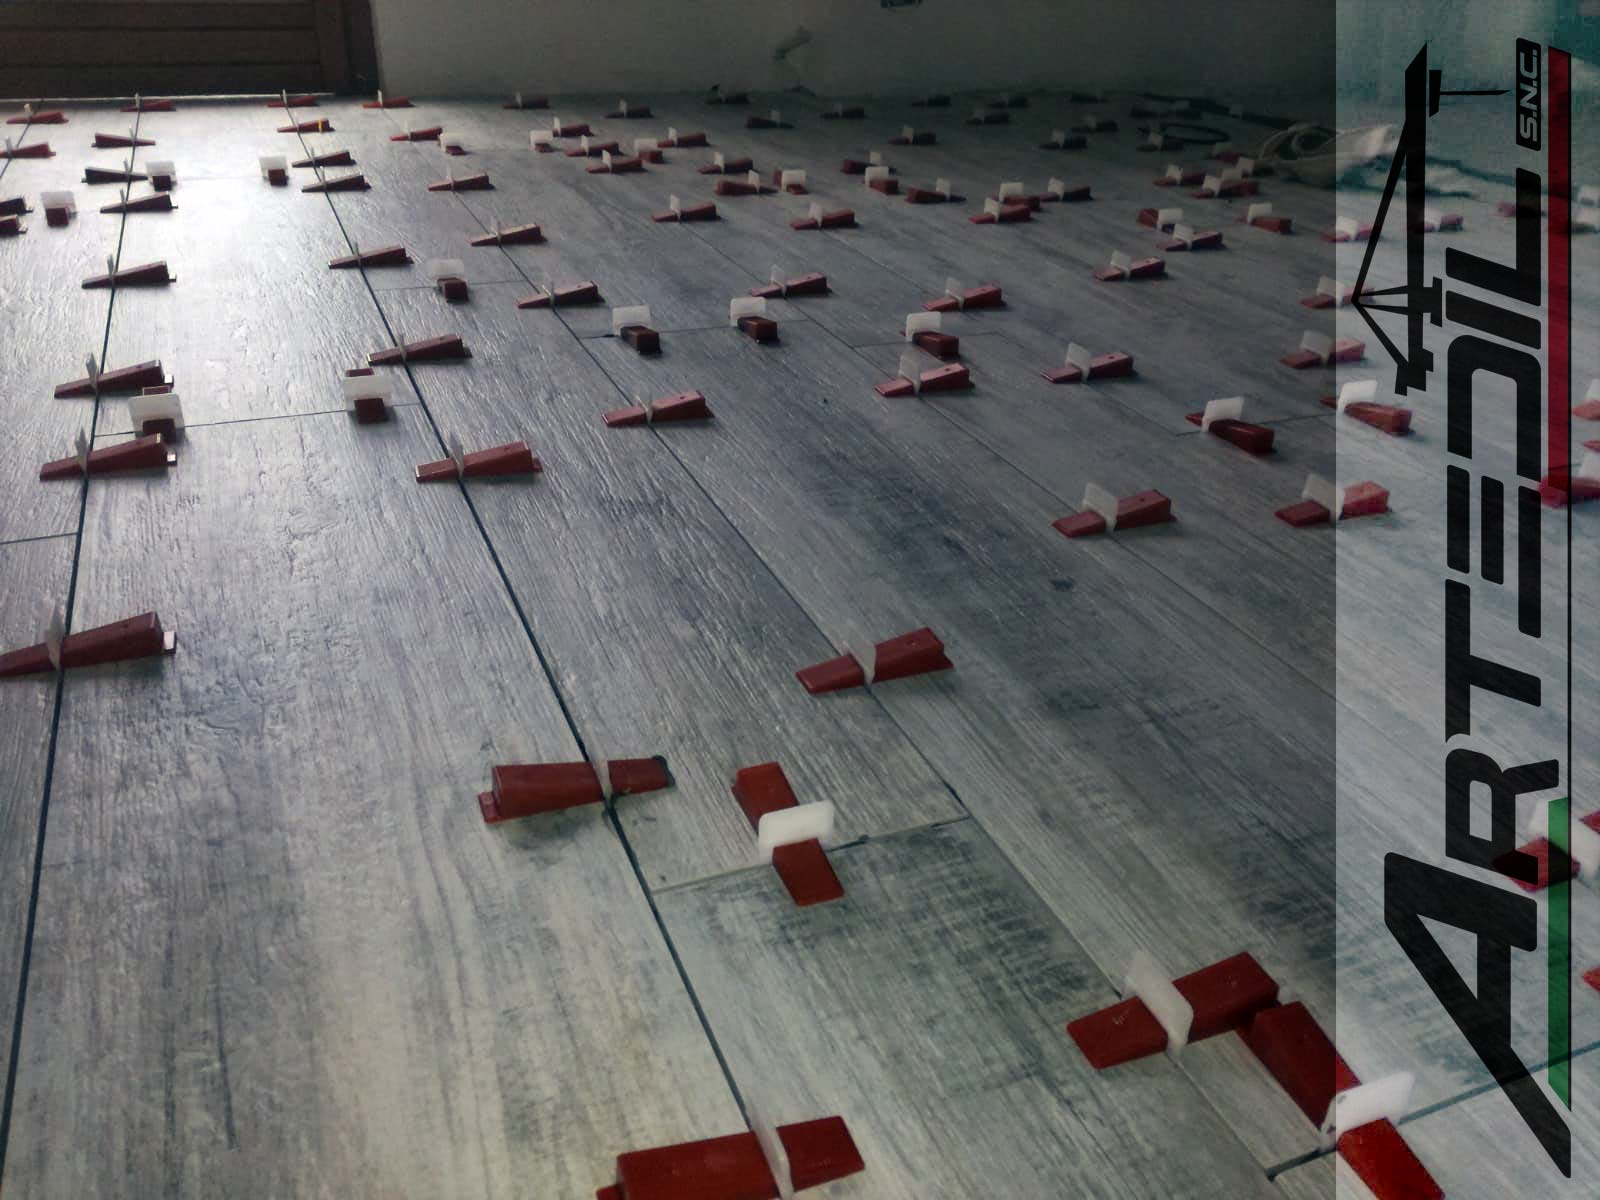 pavimentazione-interni-Artedil-003